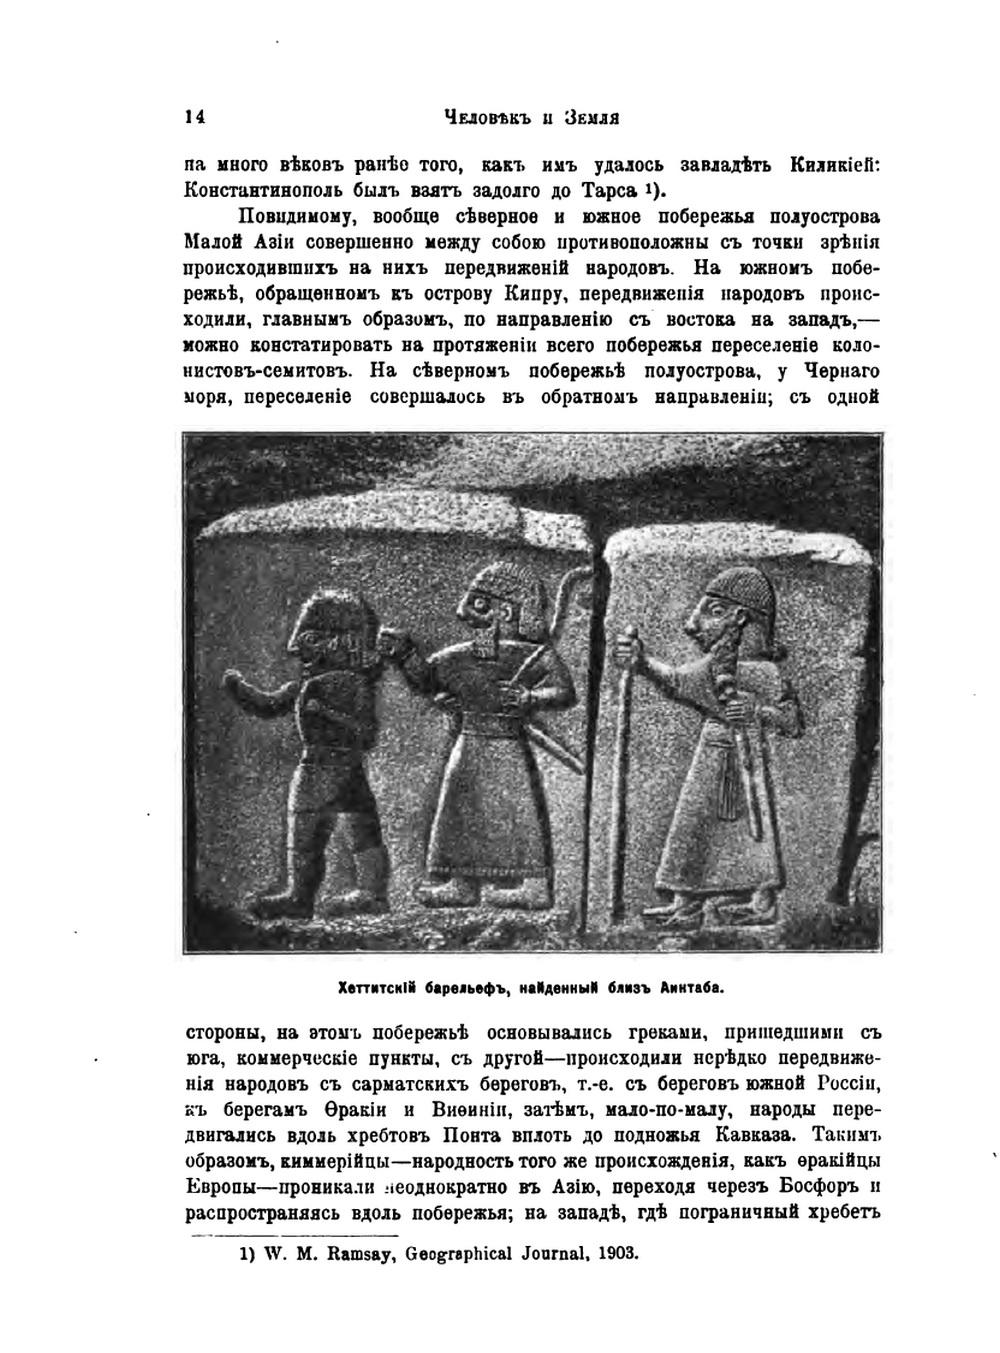 http://i1.imageban.ru/out/2013/11/19/7aa75ac9cea7afc81060cb463640e83f.jpg